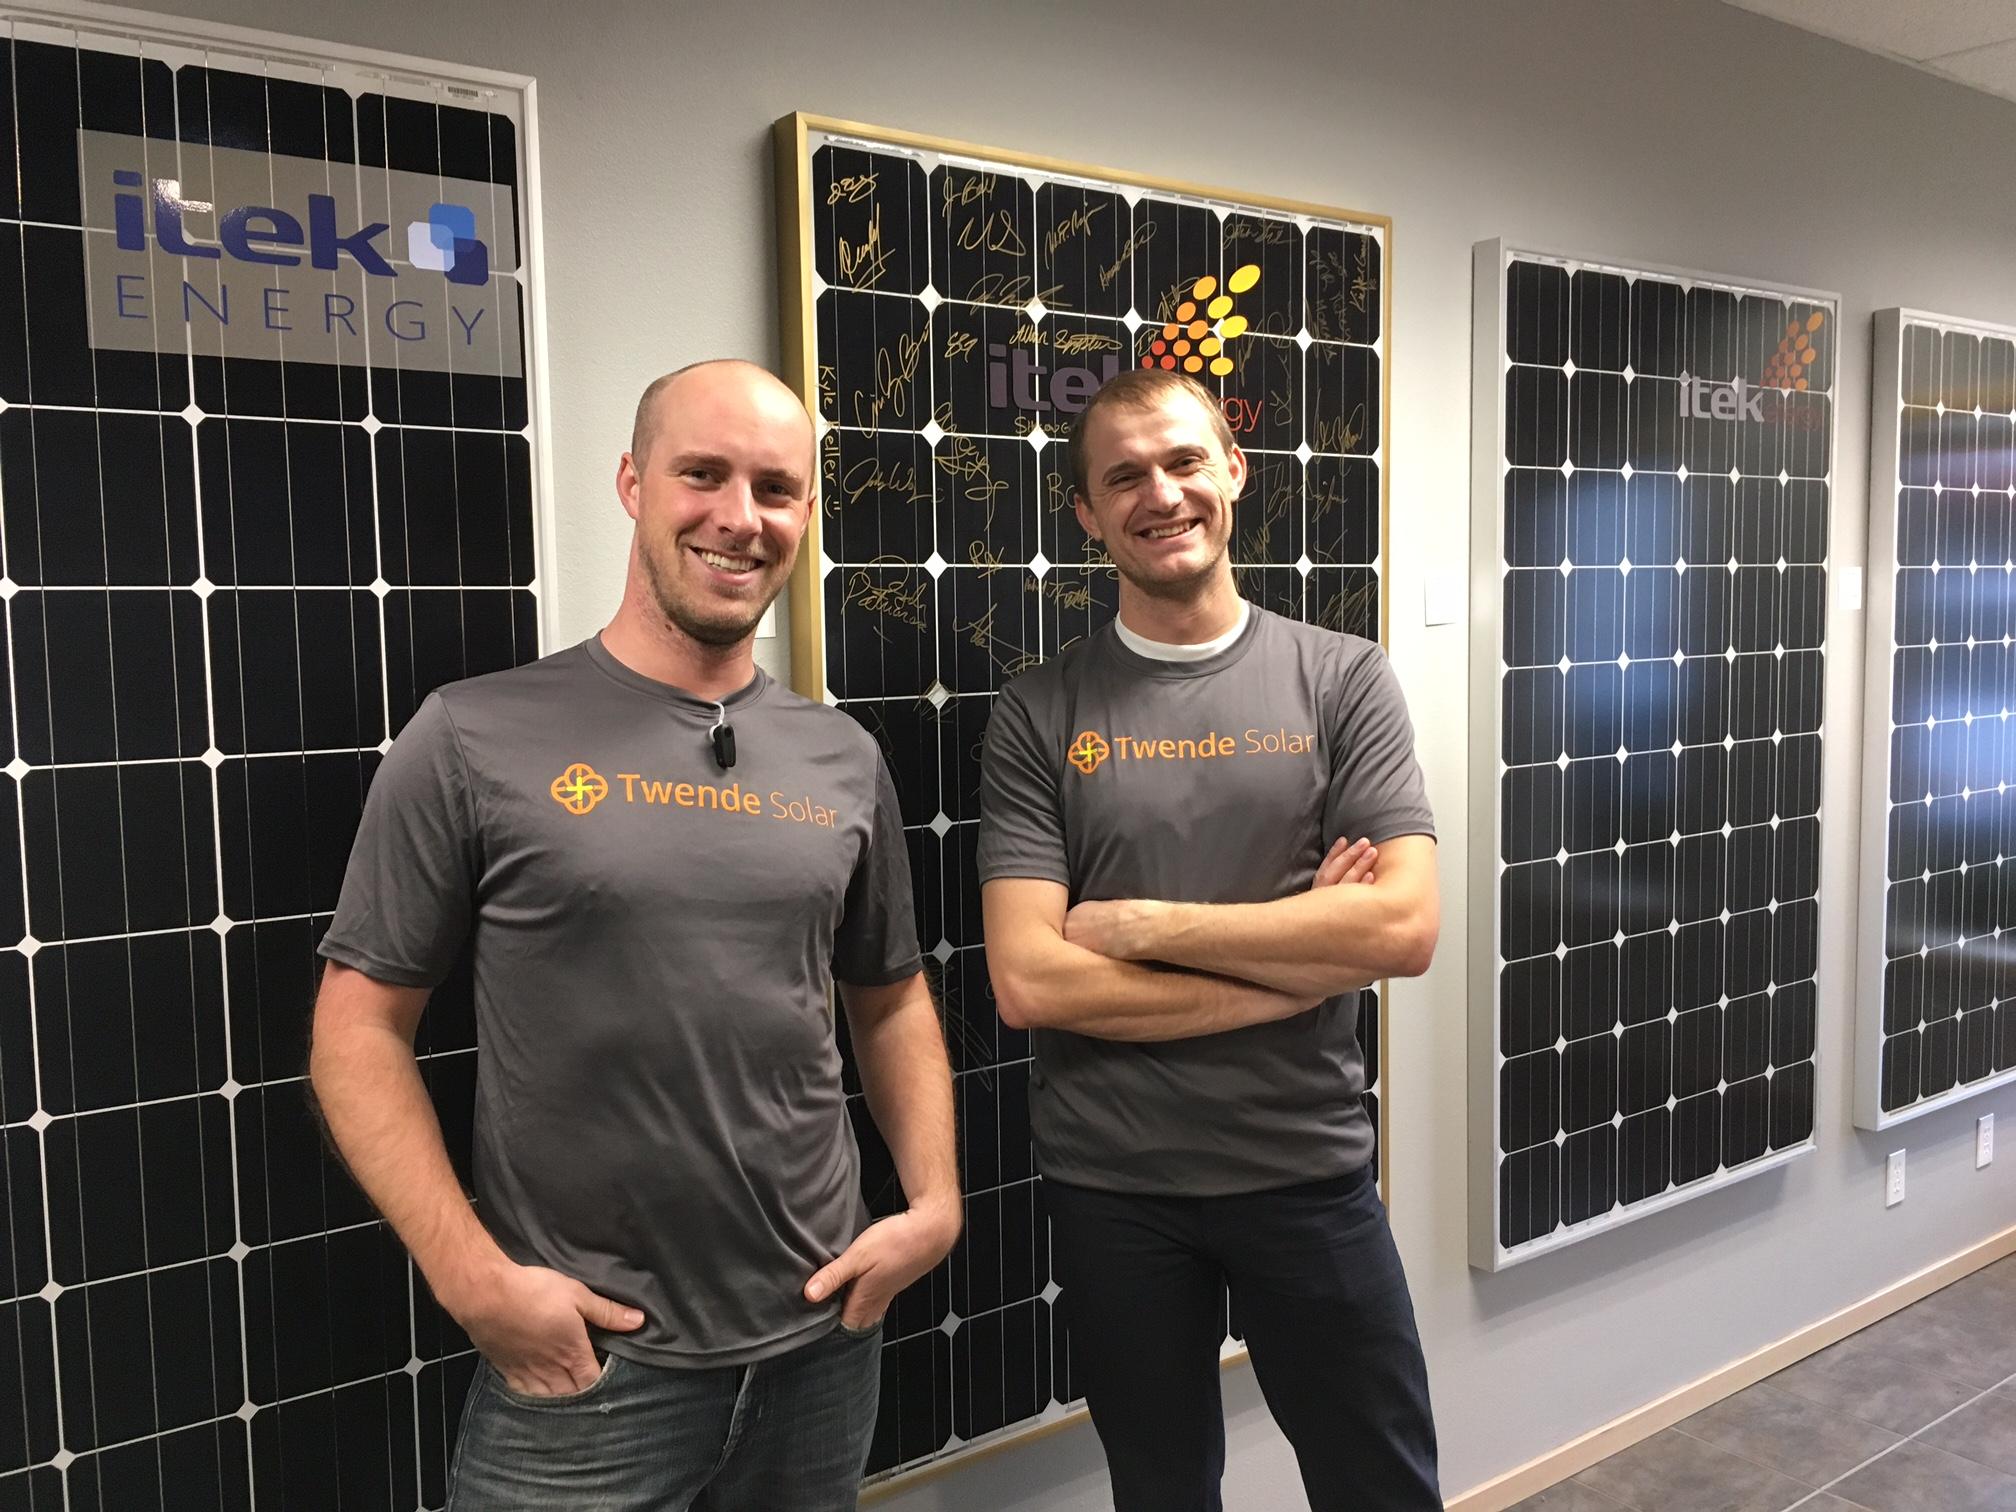 Twende Solar - Itek Energy - 6.6kW Solar PV Installation - Guatemala - Maya Jaguar School